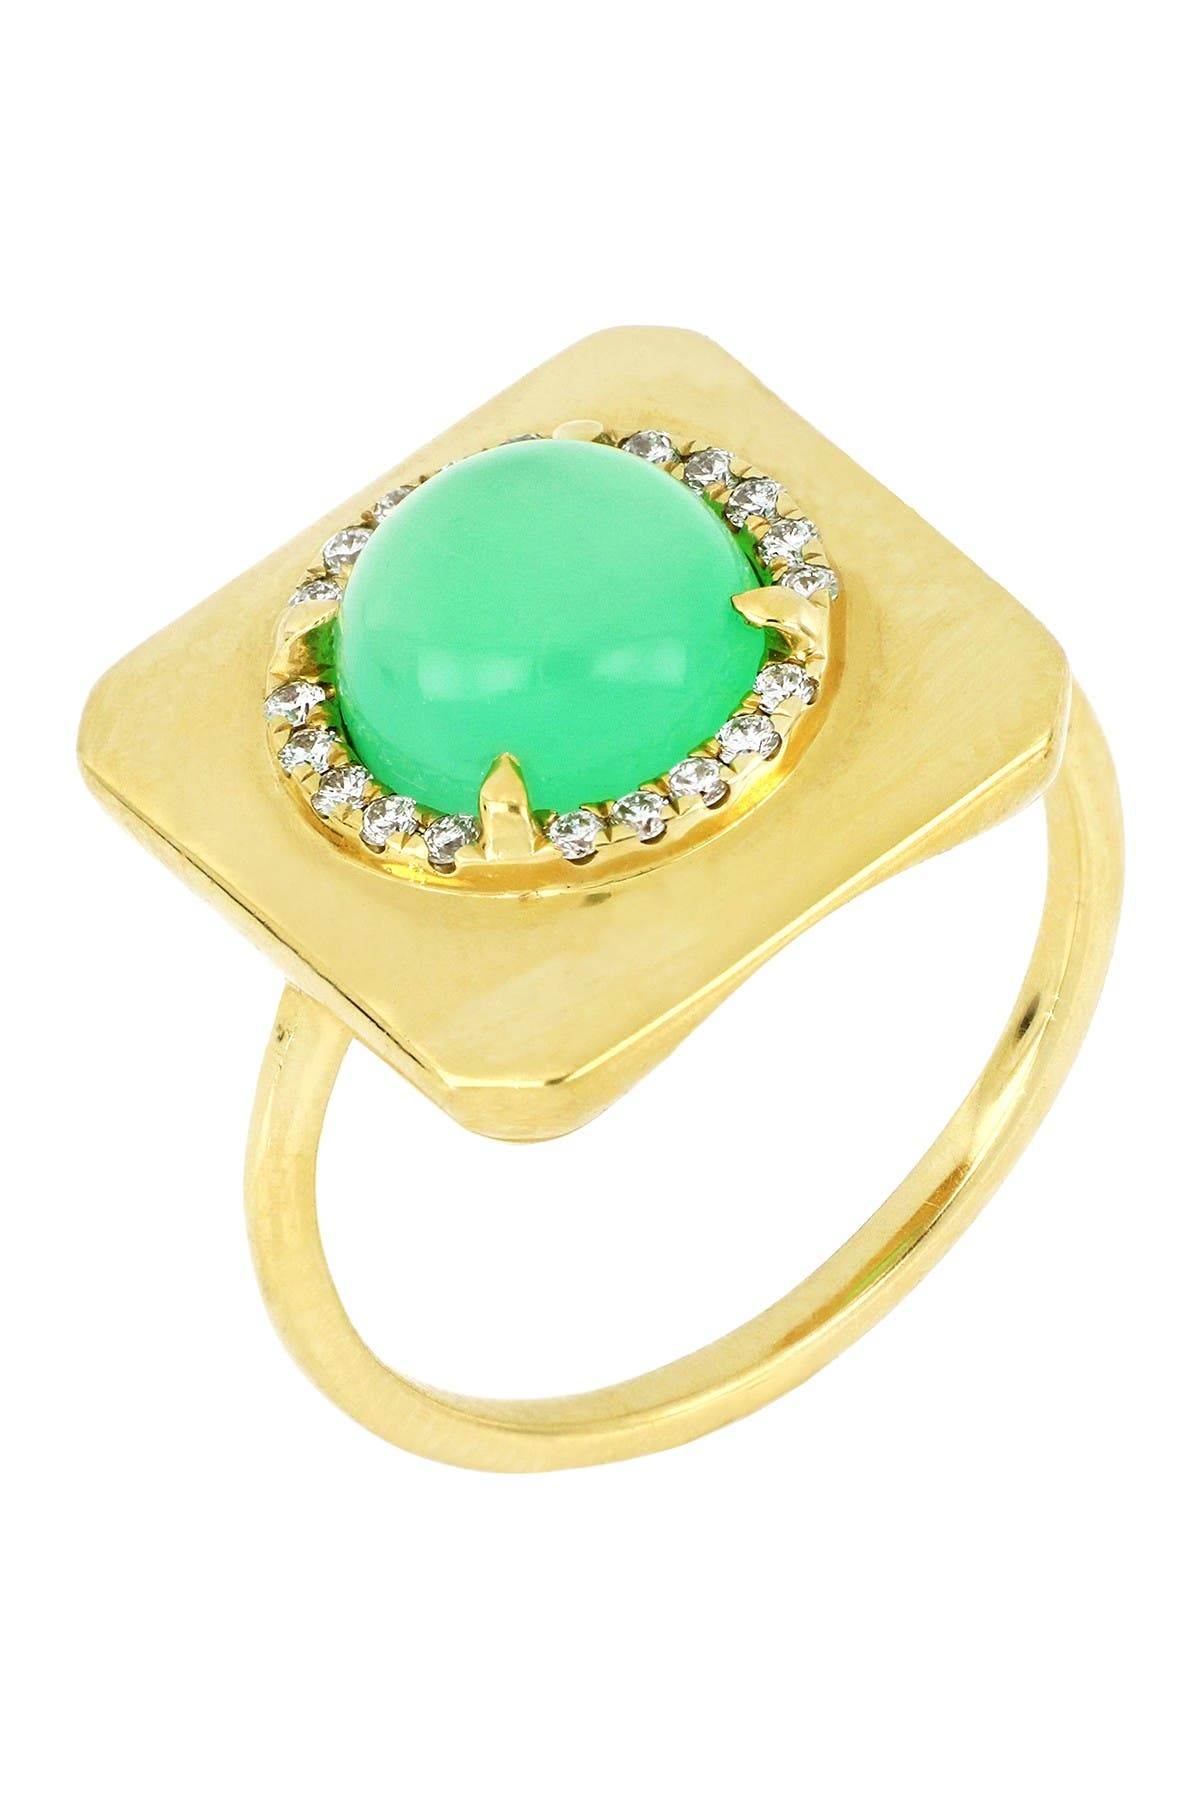 Image of Bony Levy 18K Yellow Gold Round Chrysoprase & Diamond Halo Ring - Size 6.5